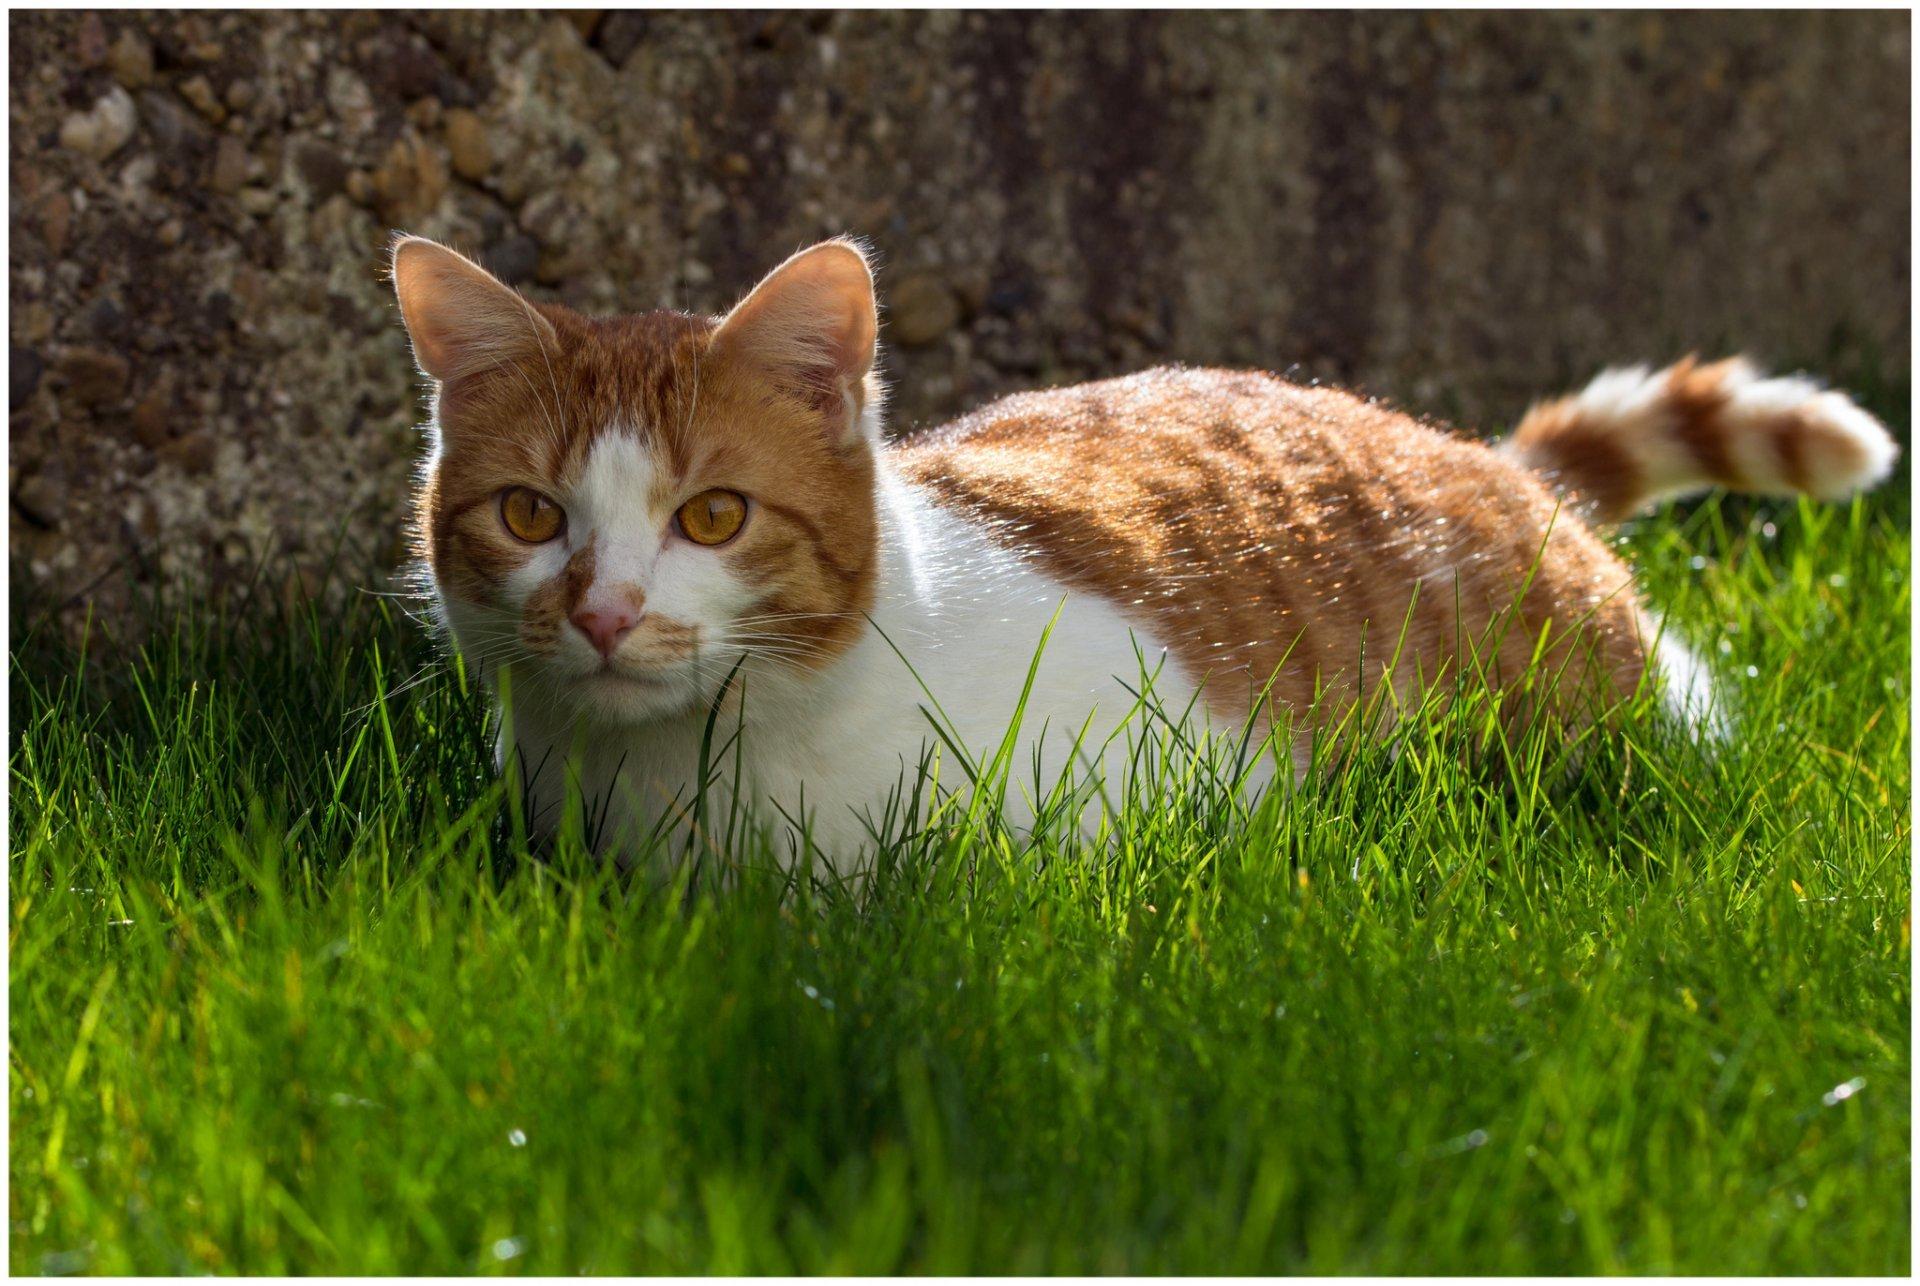 Cat Animals Grass Animal Background Wallpaper Widescreen - Cat With Grass Background , HD Wallpaper & Backgrounds